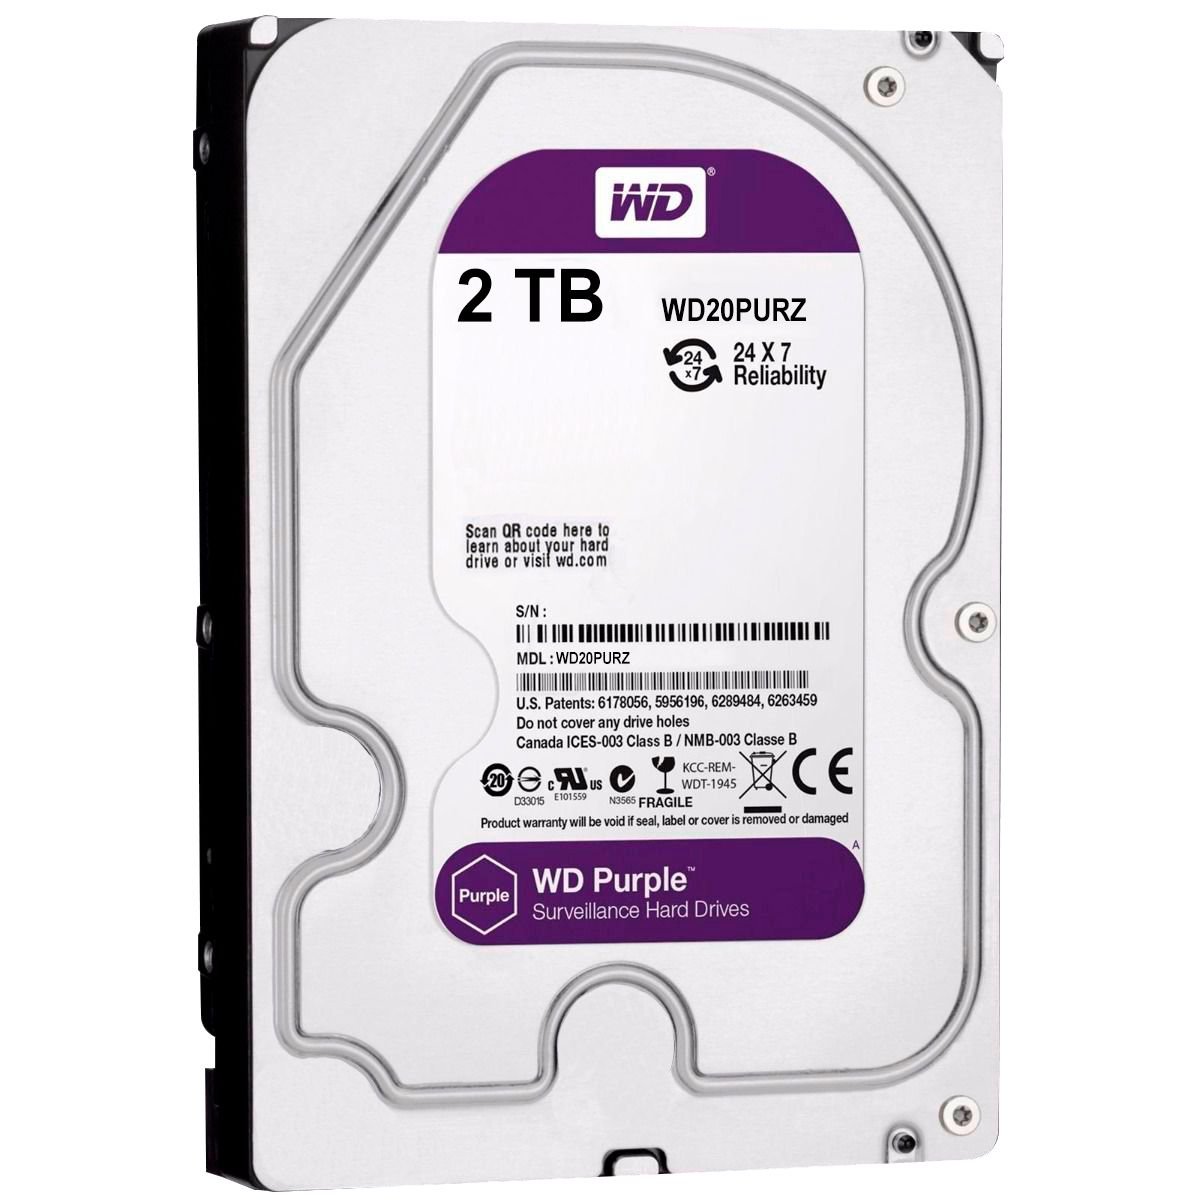 NVR, HVR Stand Alone Intelbras NVD 1208 8 Canais, para Camera IP, OnVif + HD WD Purple 2TB  - Tudo Forte